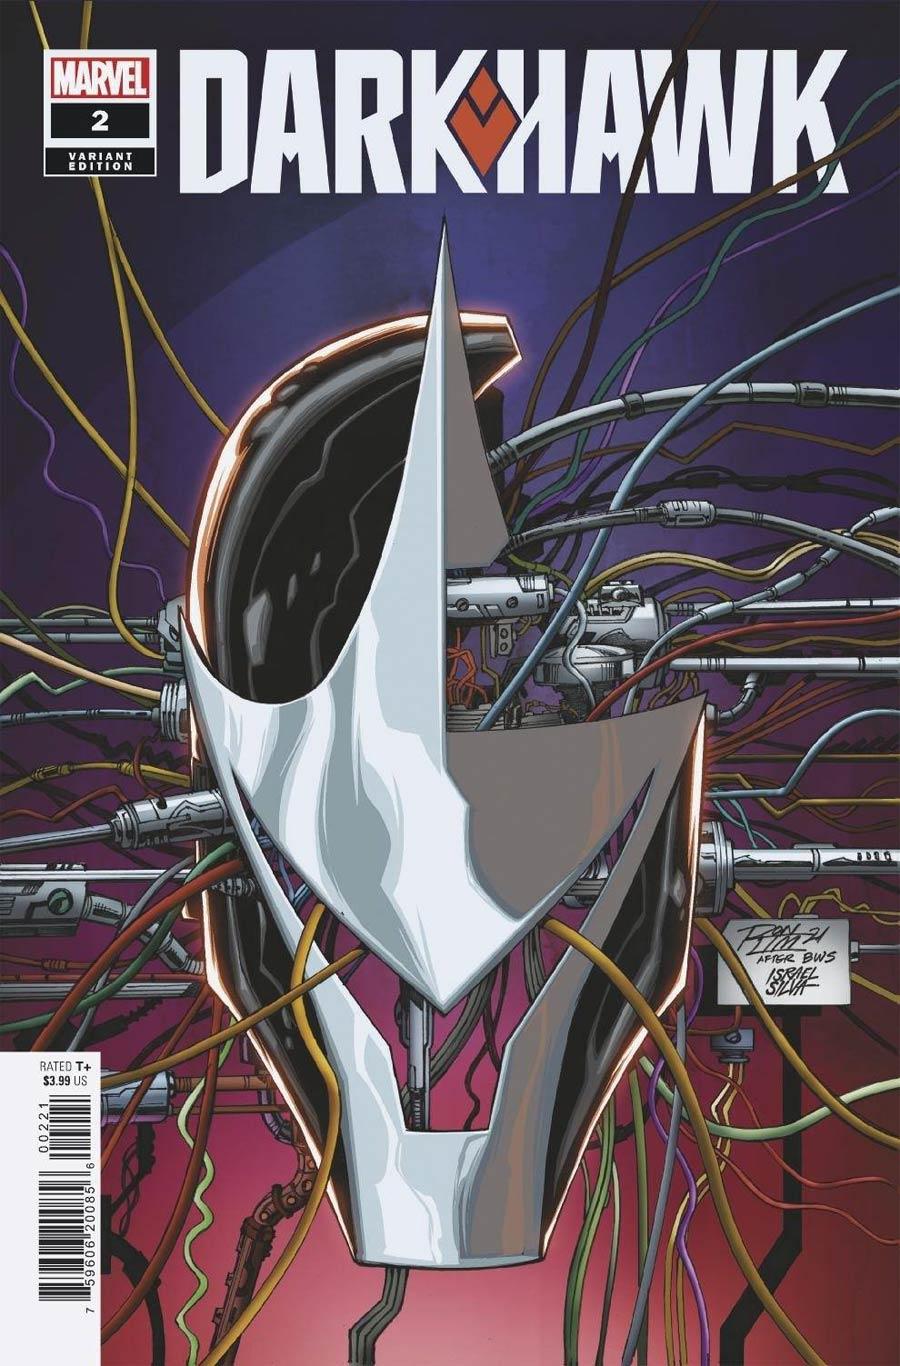 Darkhawk Vol 2 #2 Cover B Variant Ron Lim Cover